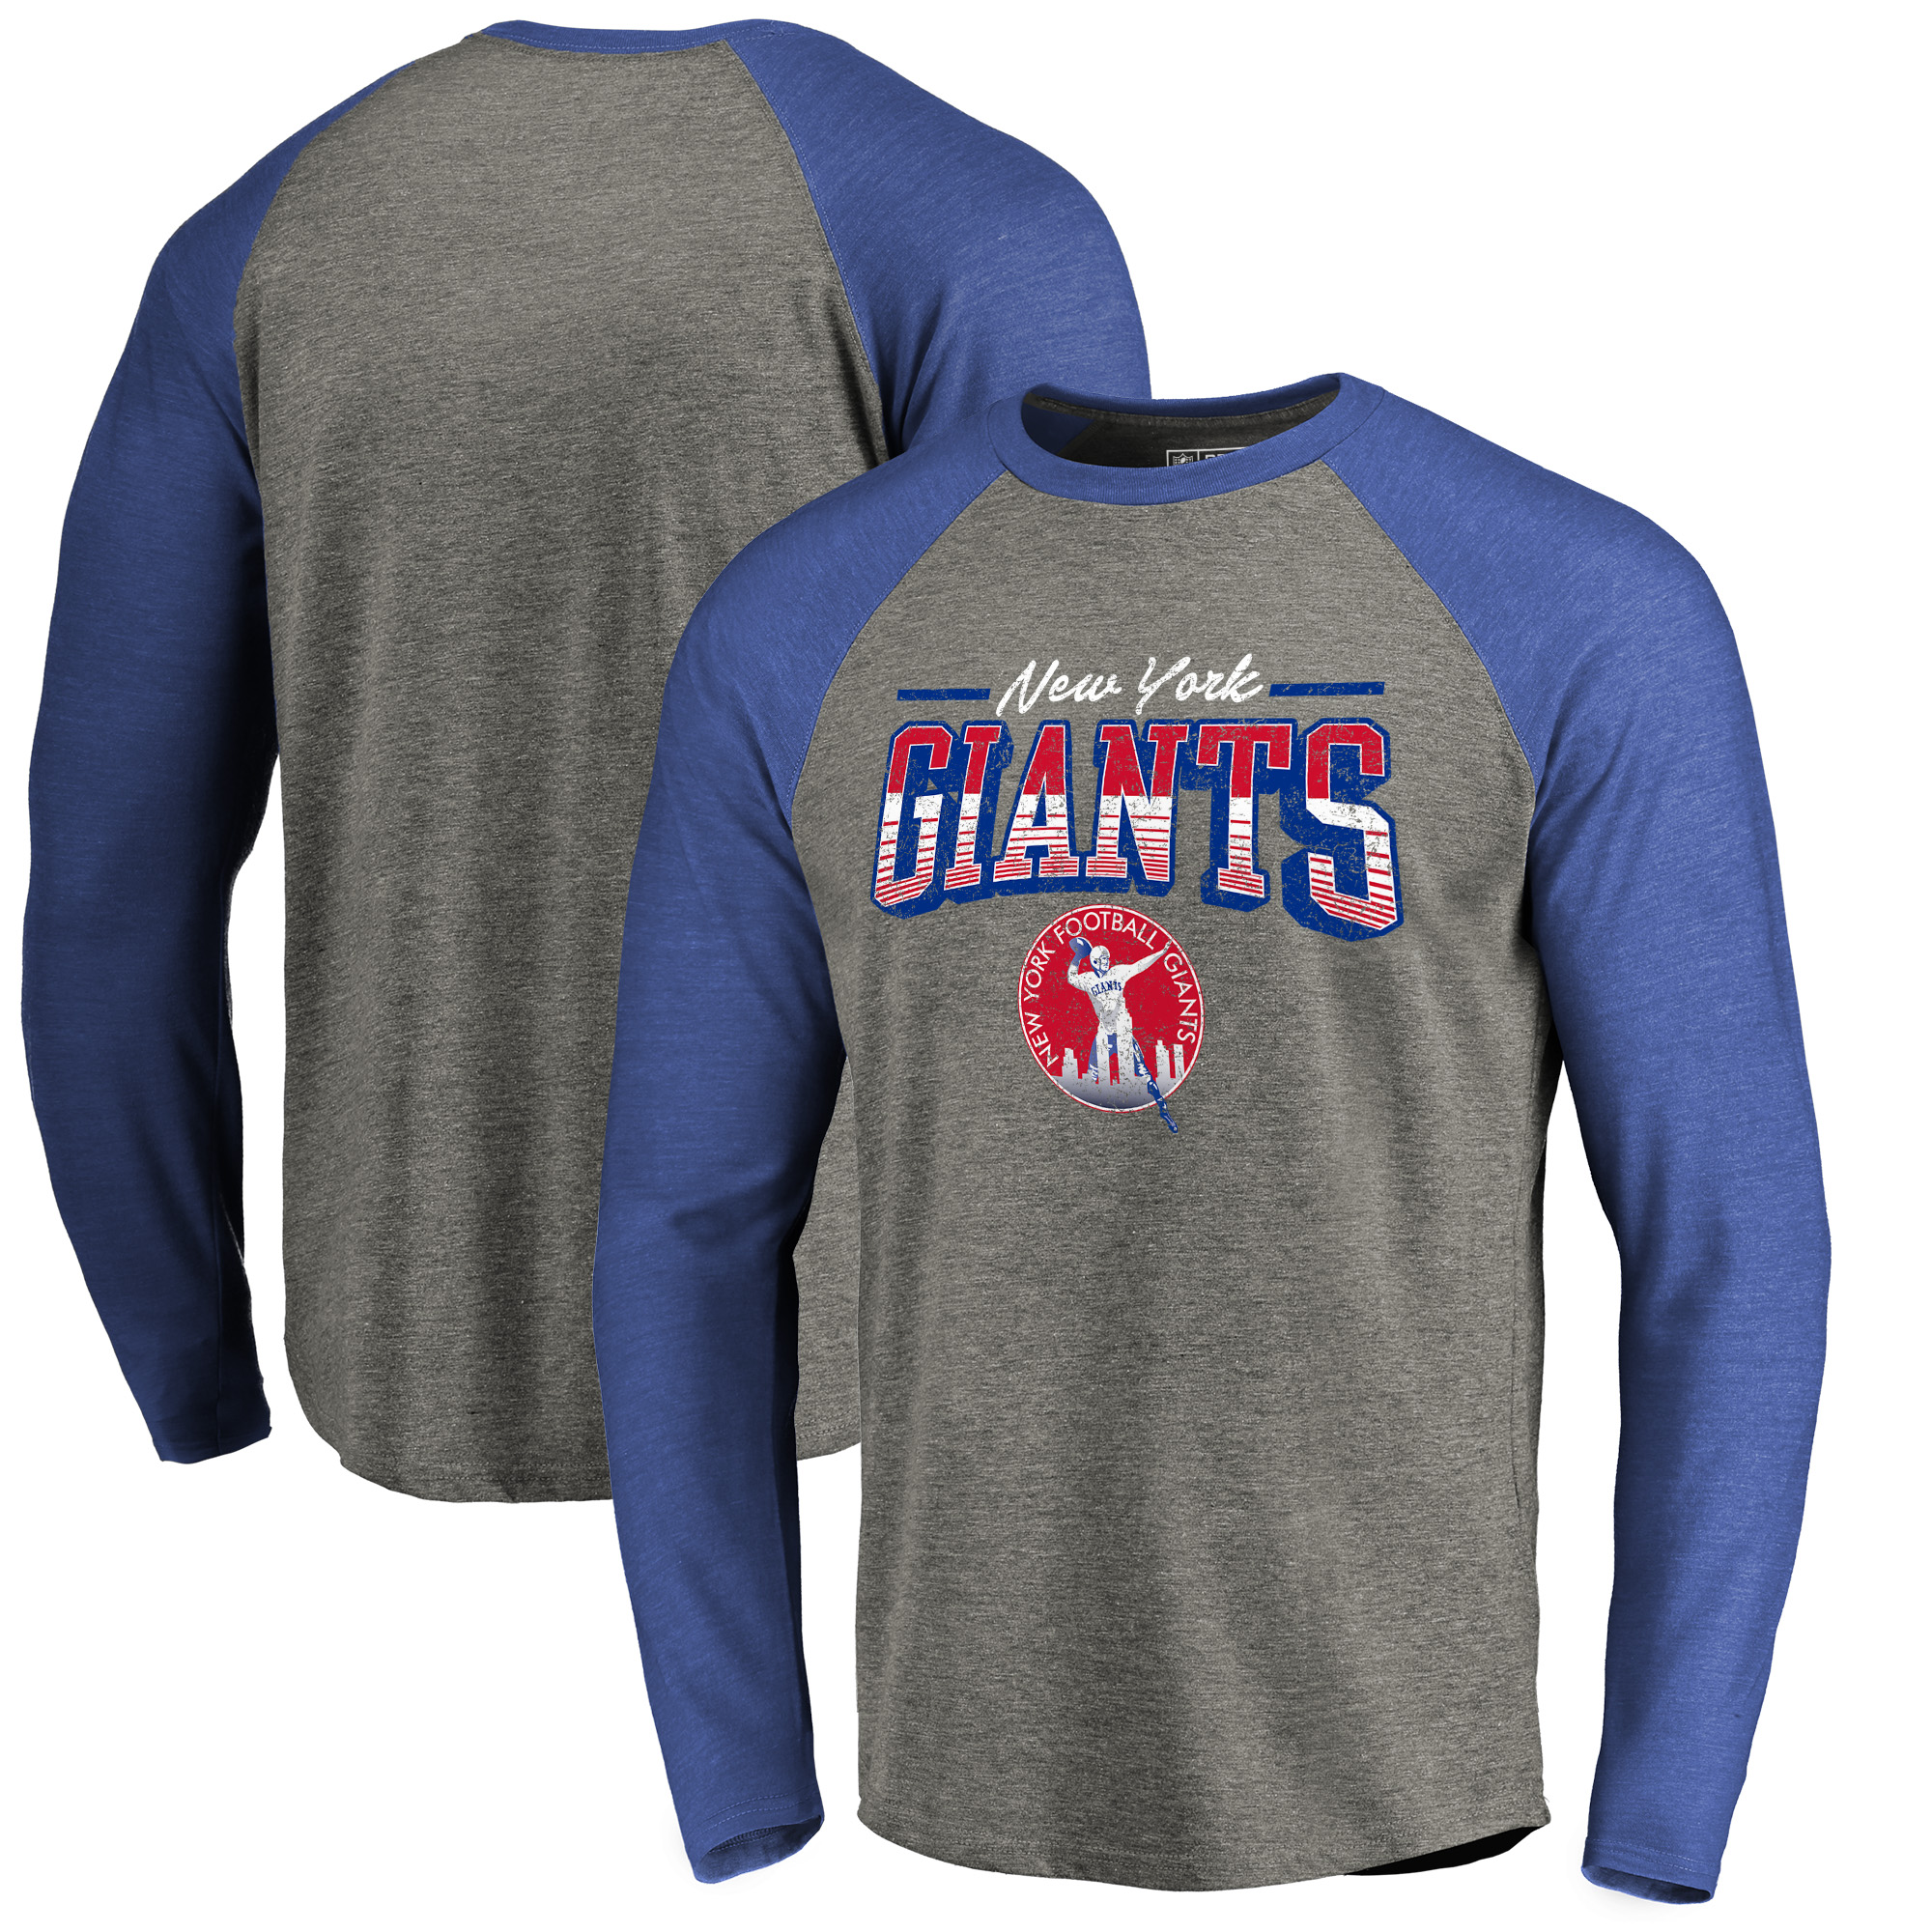 New York Giants NFL Pro Line by Fanatics Branded Throwback Collection Season Ticket Long Sleeve Tri-Blend Raglan T-Shirt - Heathered Gray/Royal